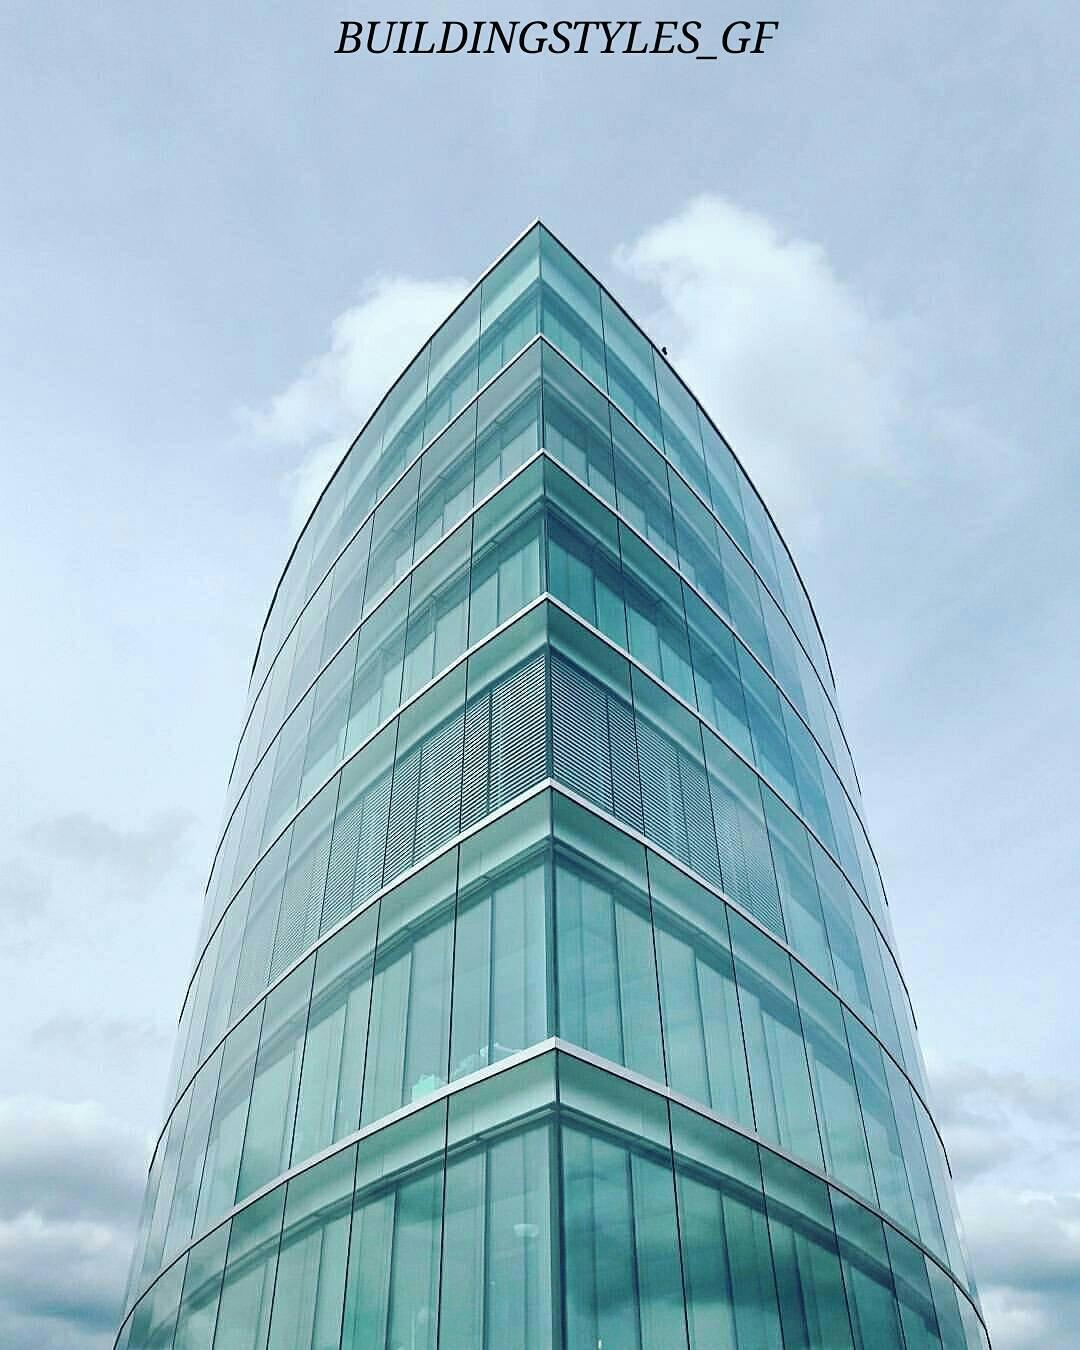 imagenes-de-edificios-modernos1163